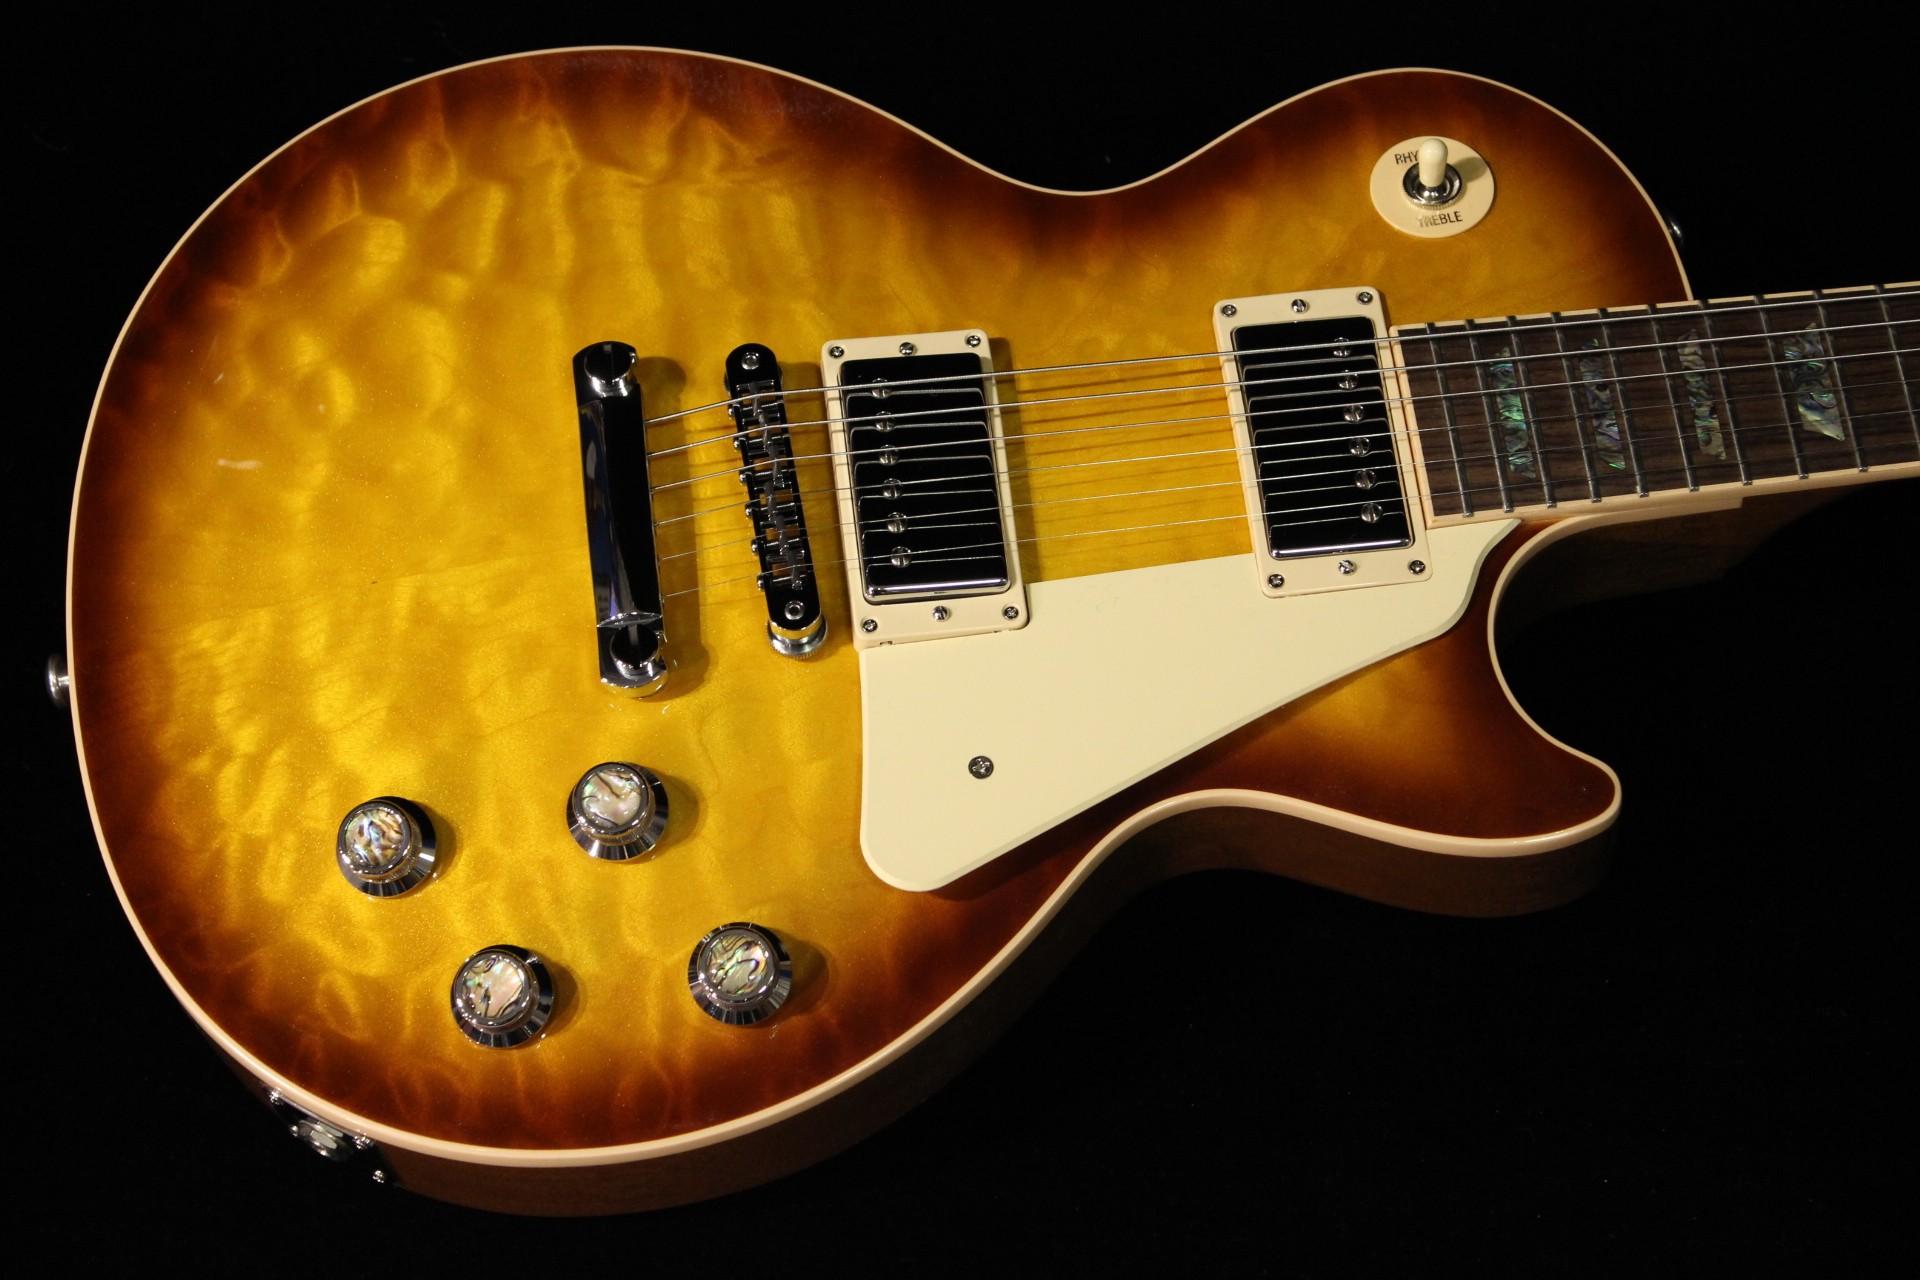 Gibson Les Paul Standard Premium Quilt 2015 Honey Burst